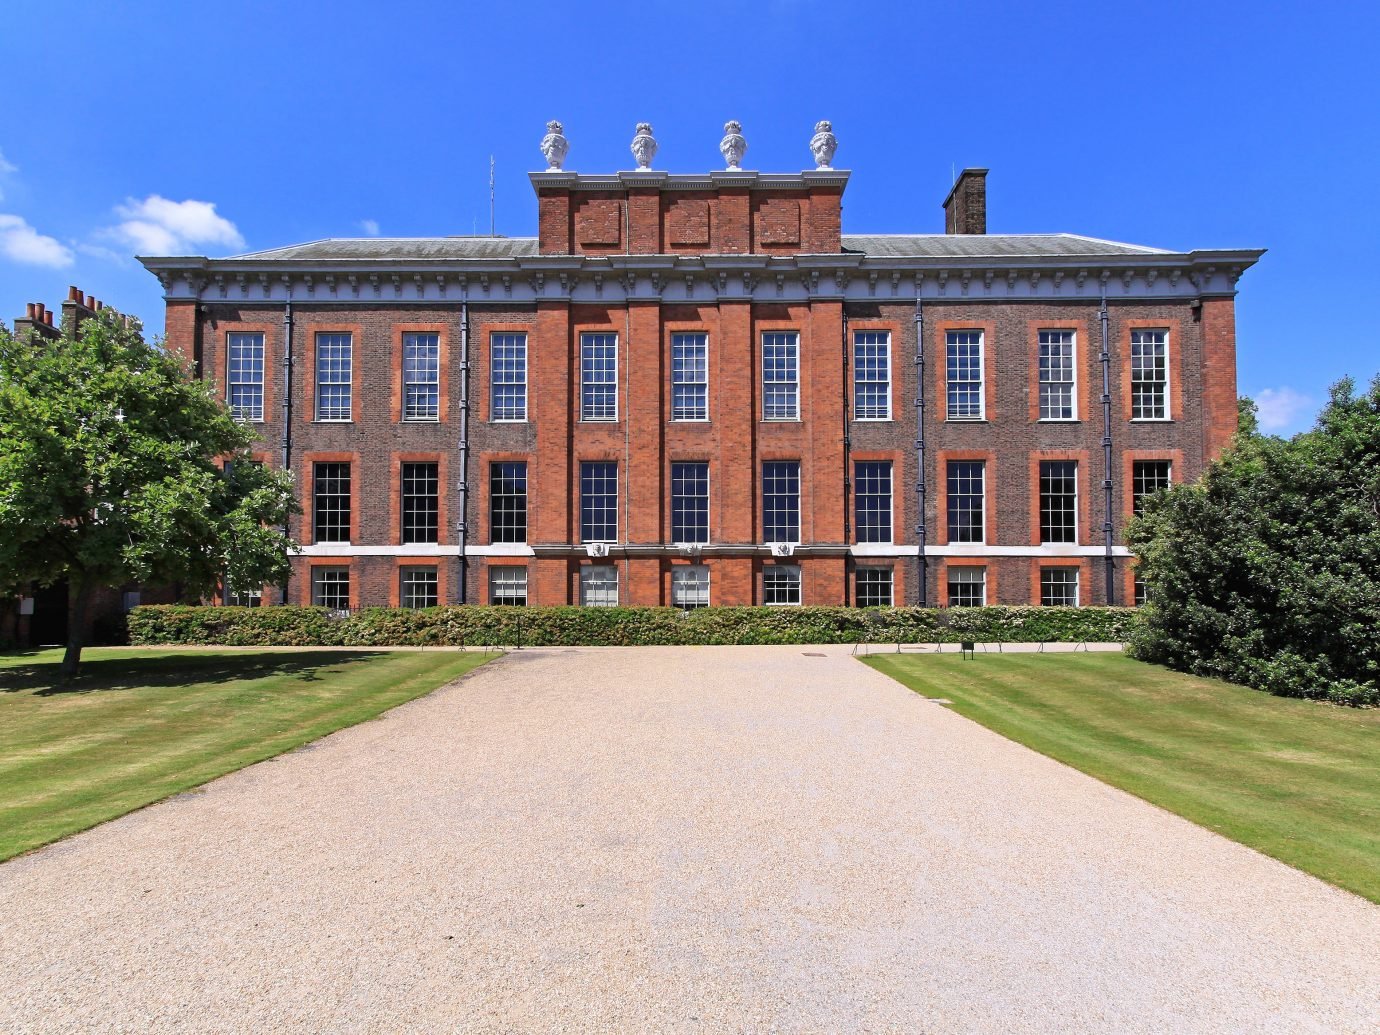 Kensington Palace official residence of Princess Diana in London